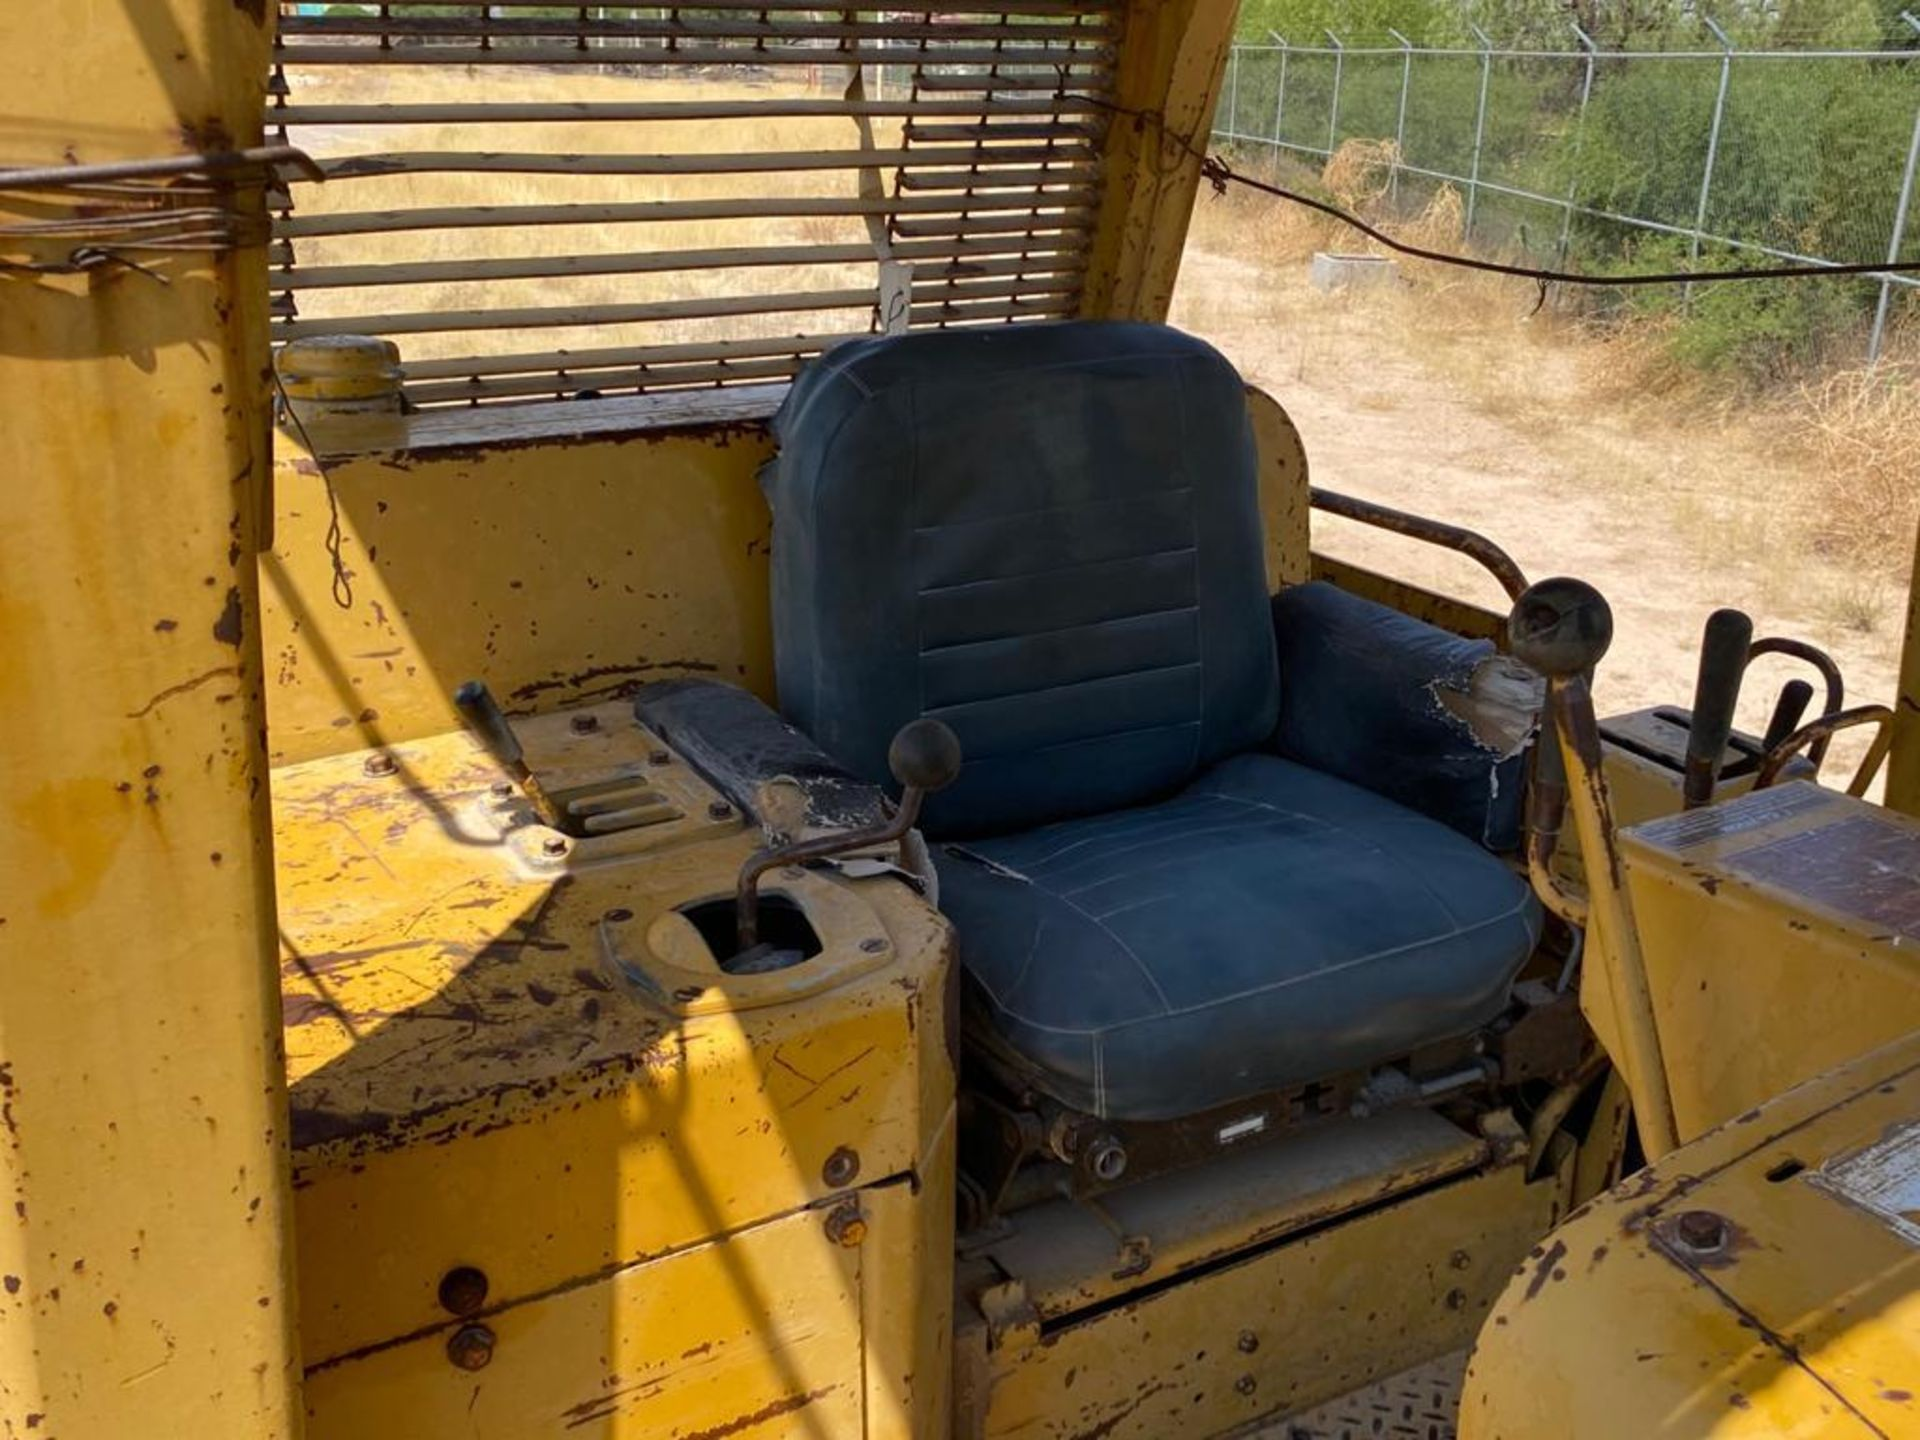 Caterpillar D7G Bulldozer, Serial number 92V5897, Diesel motor - Image 45 of 48